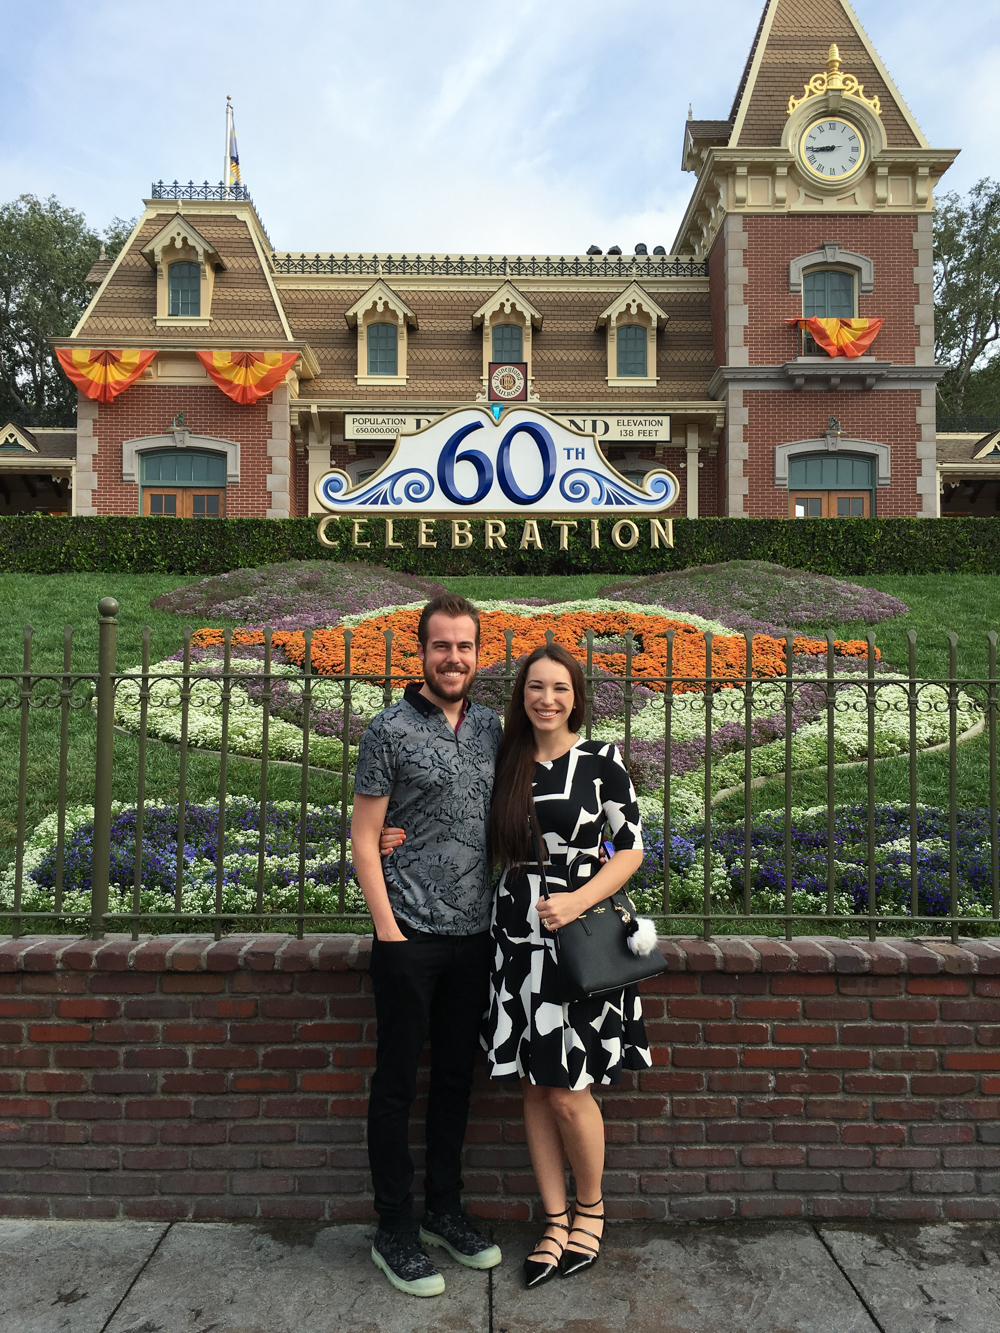 Disneyland at Halloween Time